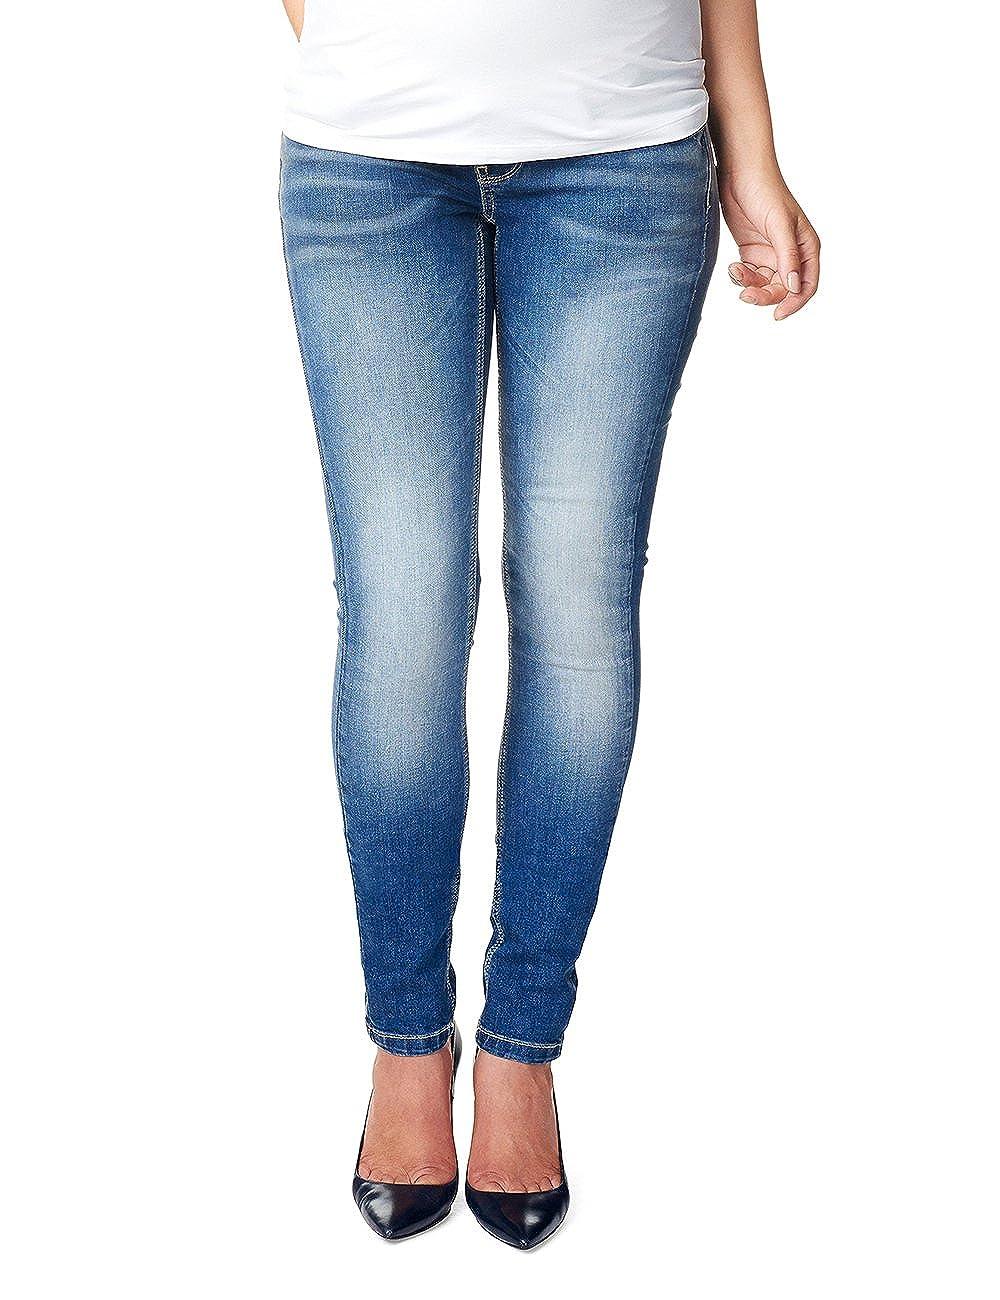 5c8bbe9d09451 Noppies Women's Jeans OTB Skinny Tara Maternity Jeans: Amazon.co.uk:  Clothing